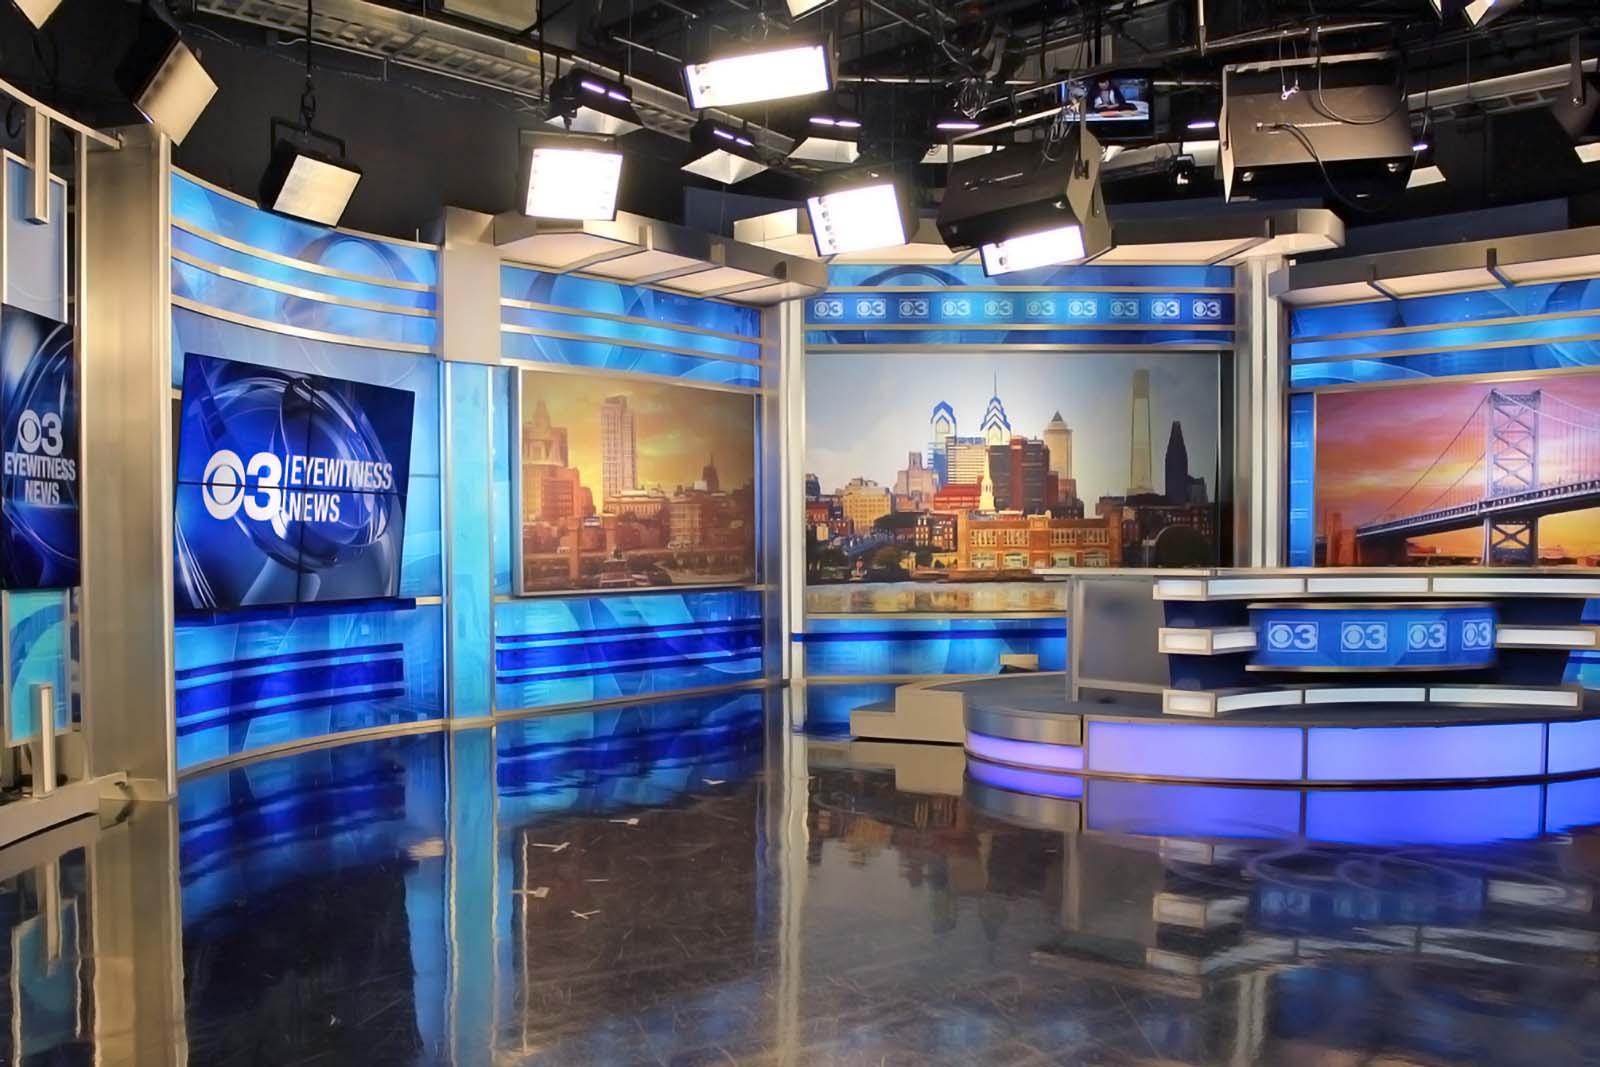 CBS 3 News Philly studio